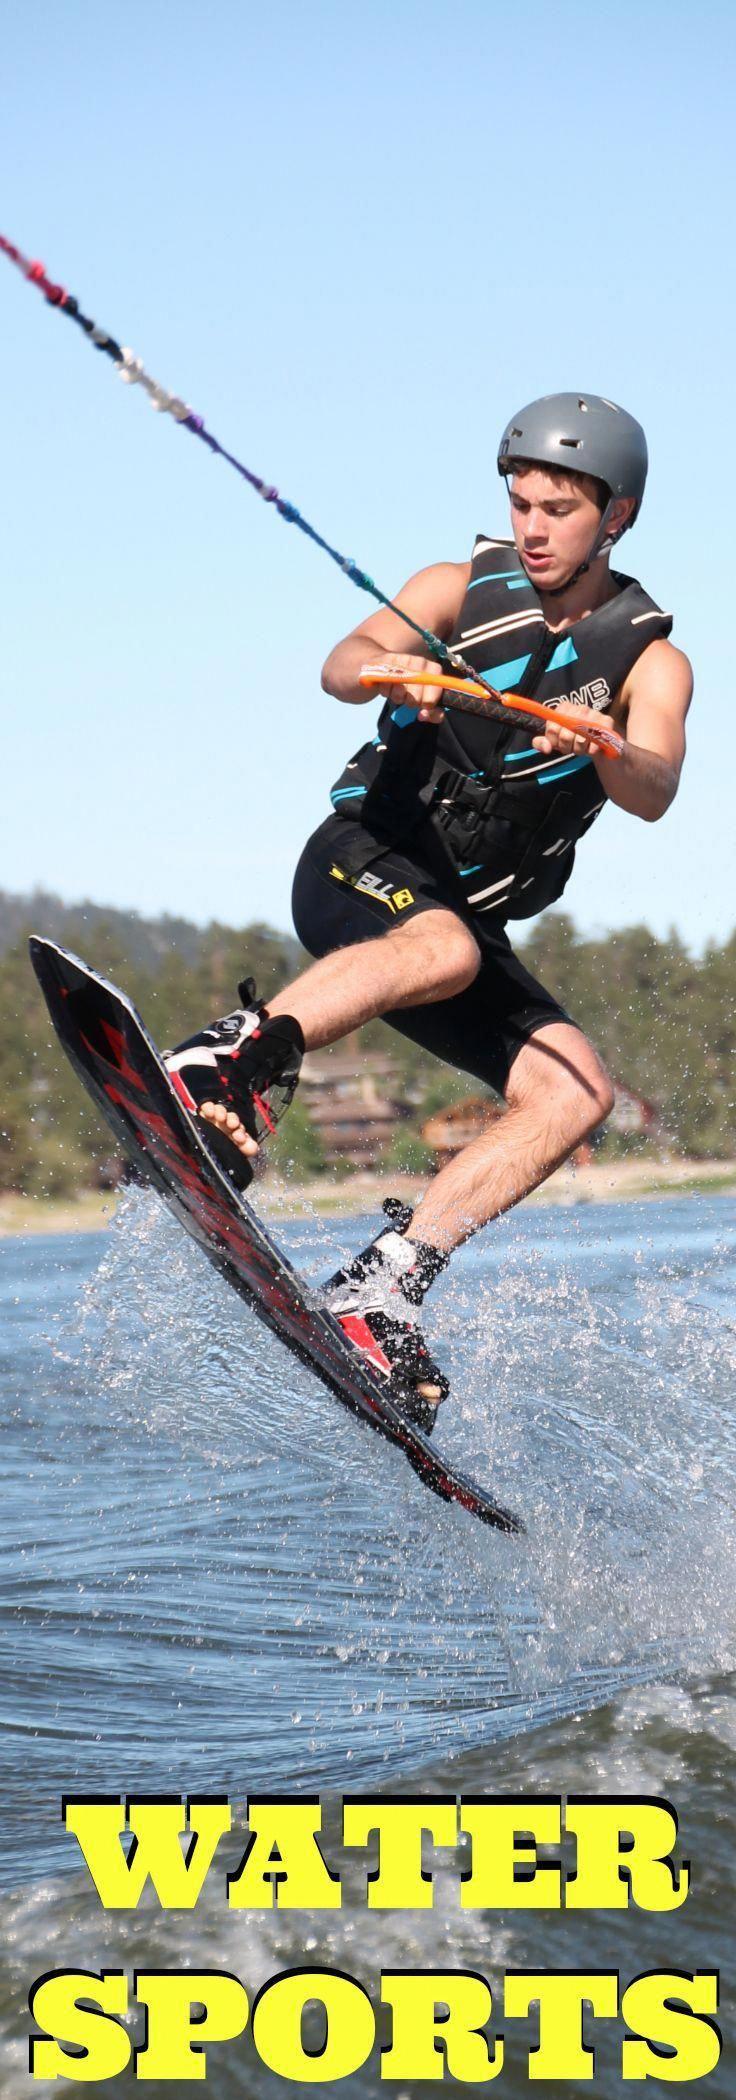 Water Sports Camp! Wakeboard, Water Ski, Jet Ski and more